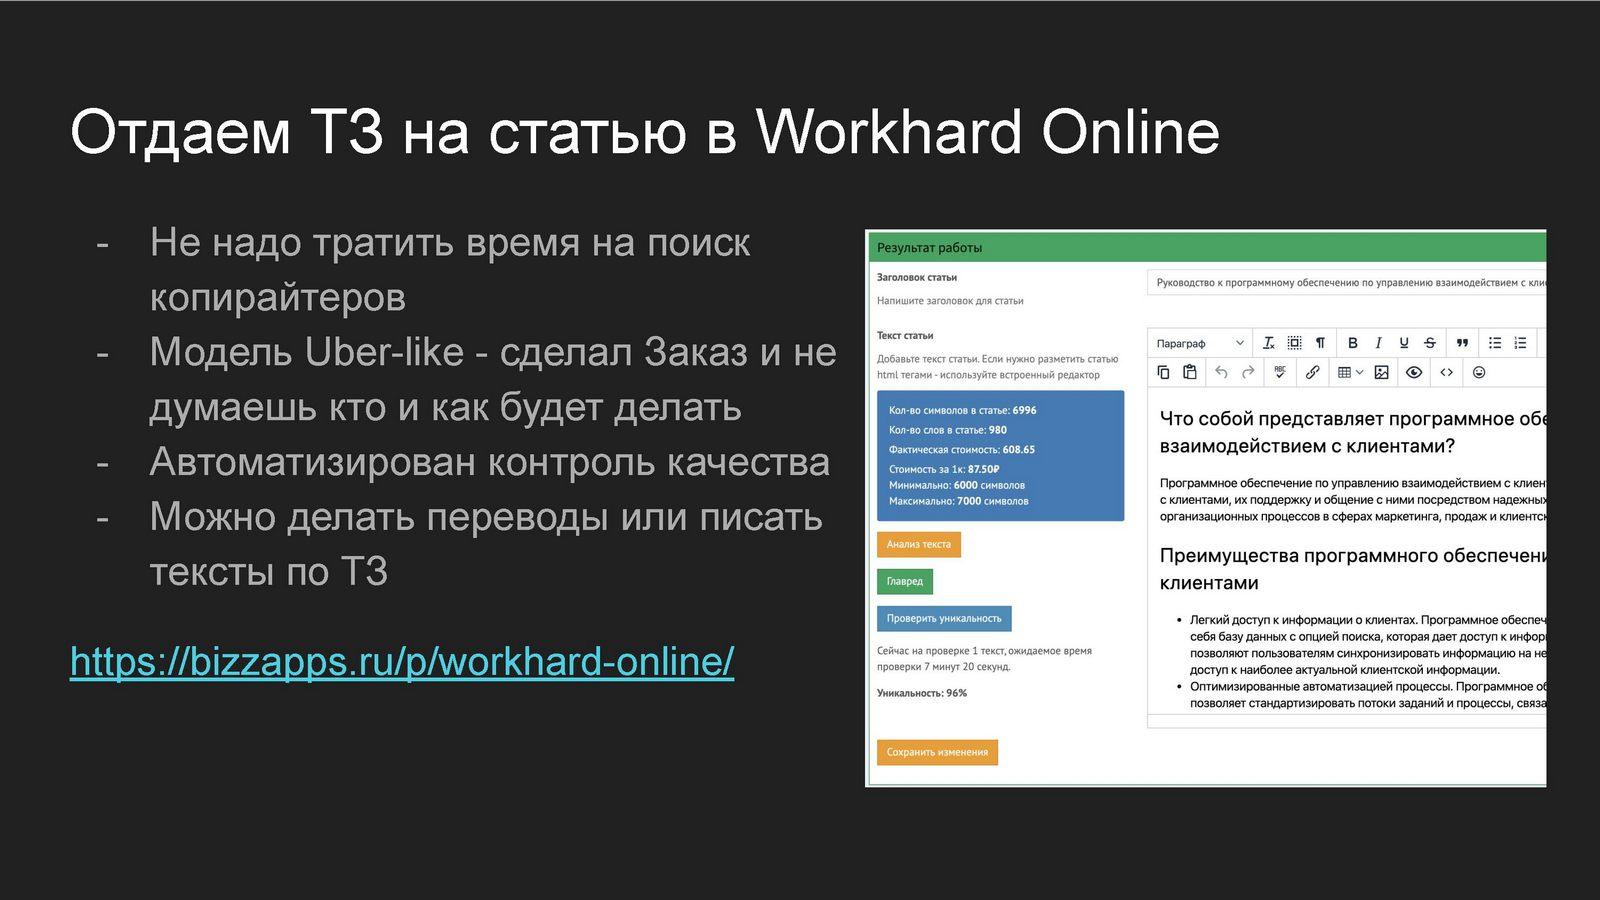 wp10-Анатолий Юмашев-Агрегатор bizzapps.ru 10